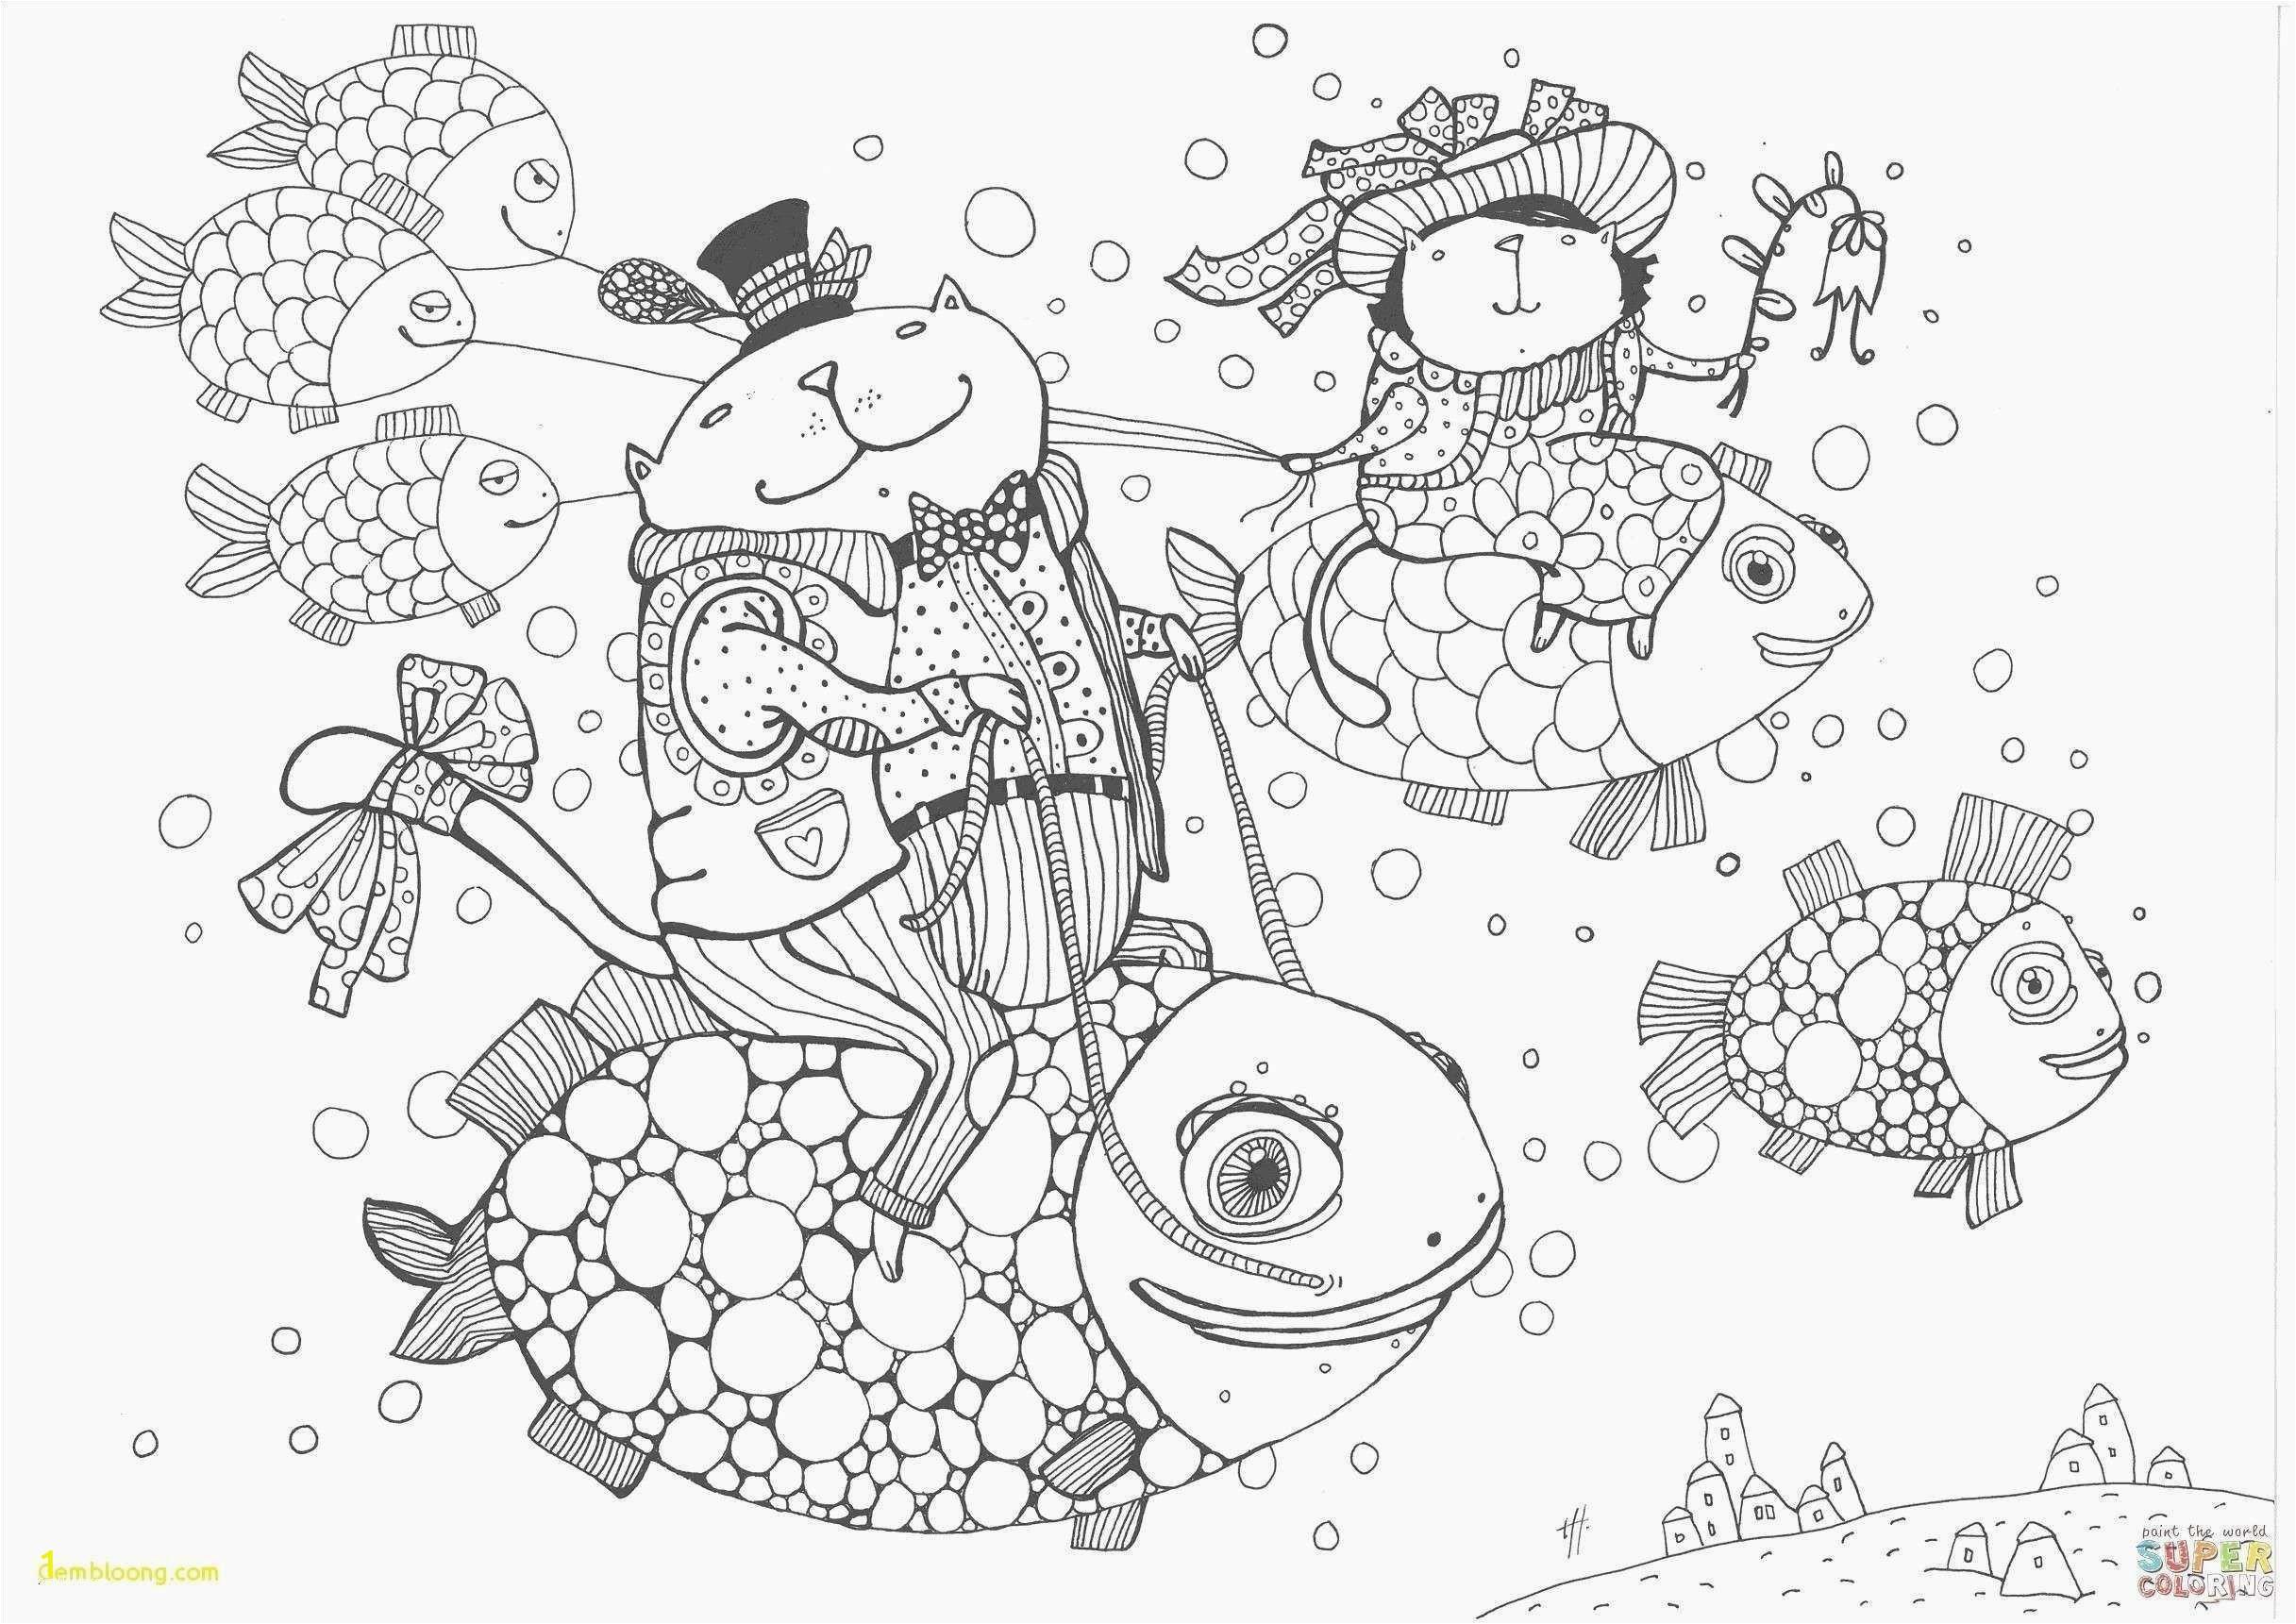 printables coloring pages for adults unique kreuz zum ausmalen 22 ausmalbilder von rosen ausmalbild of printables coloring pages for adults